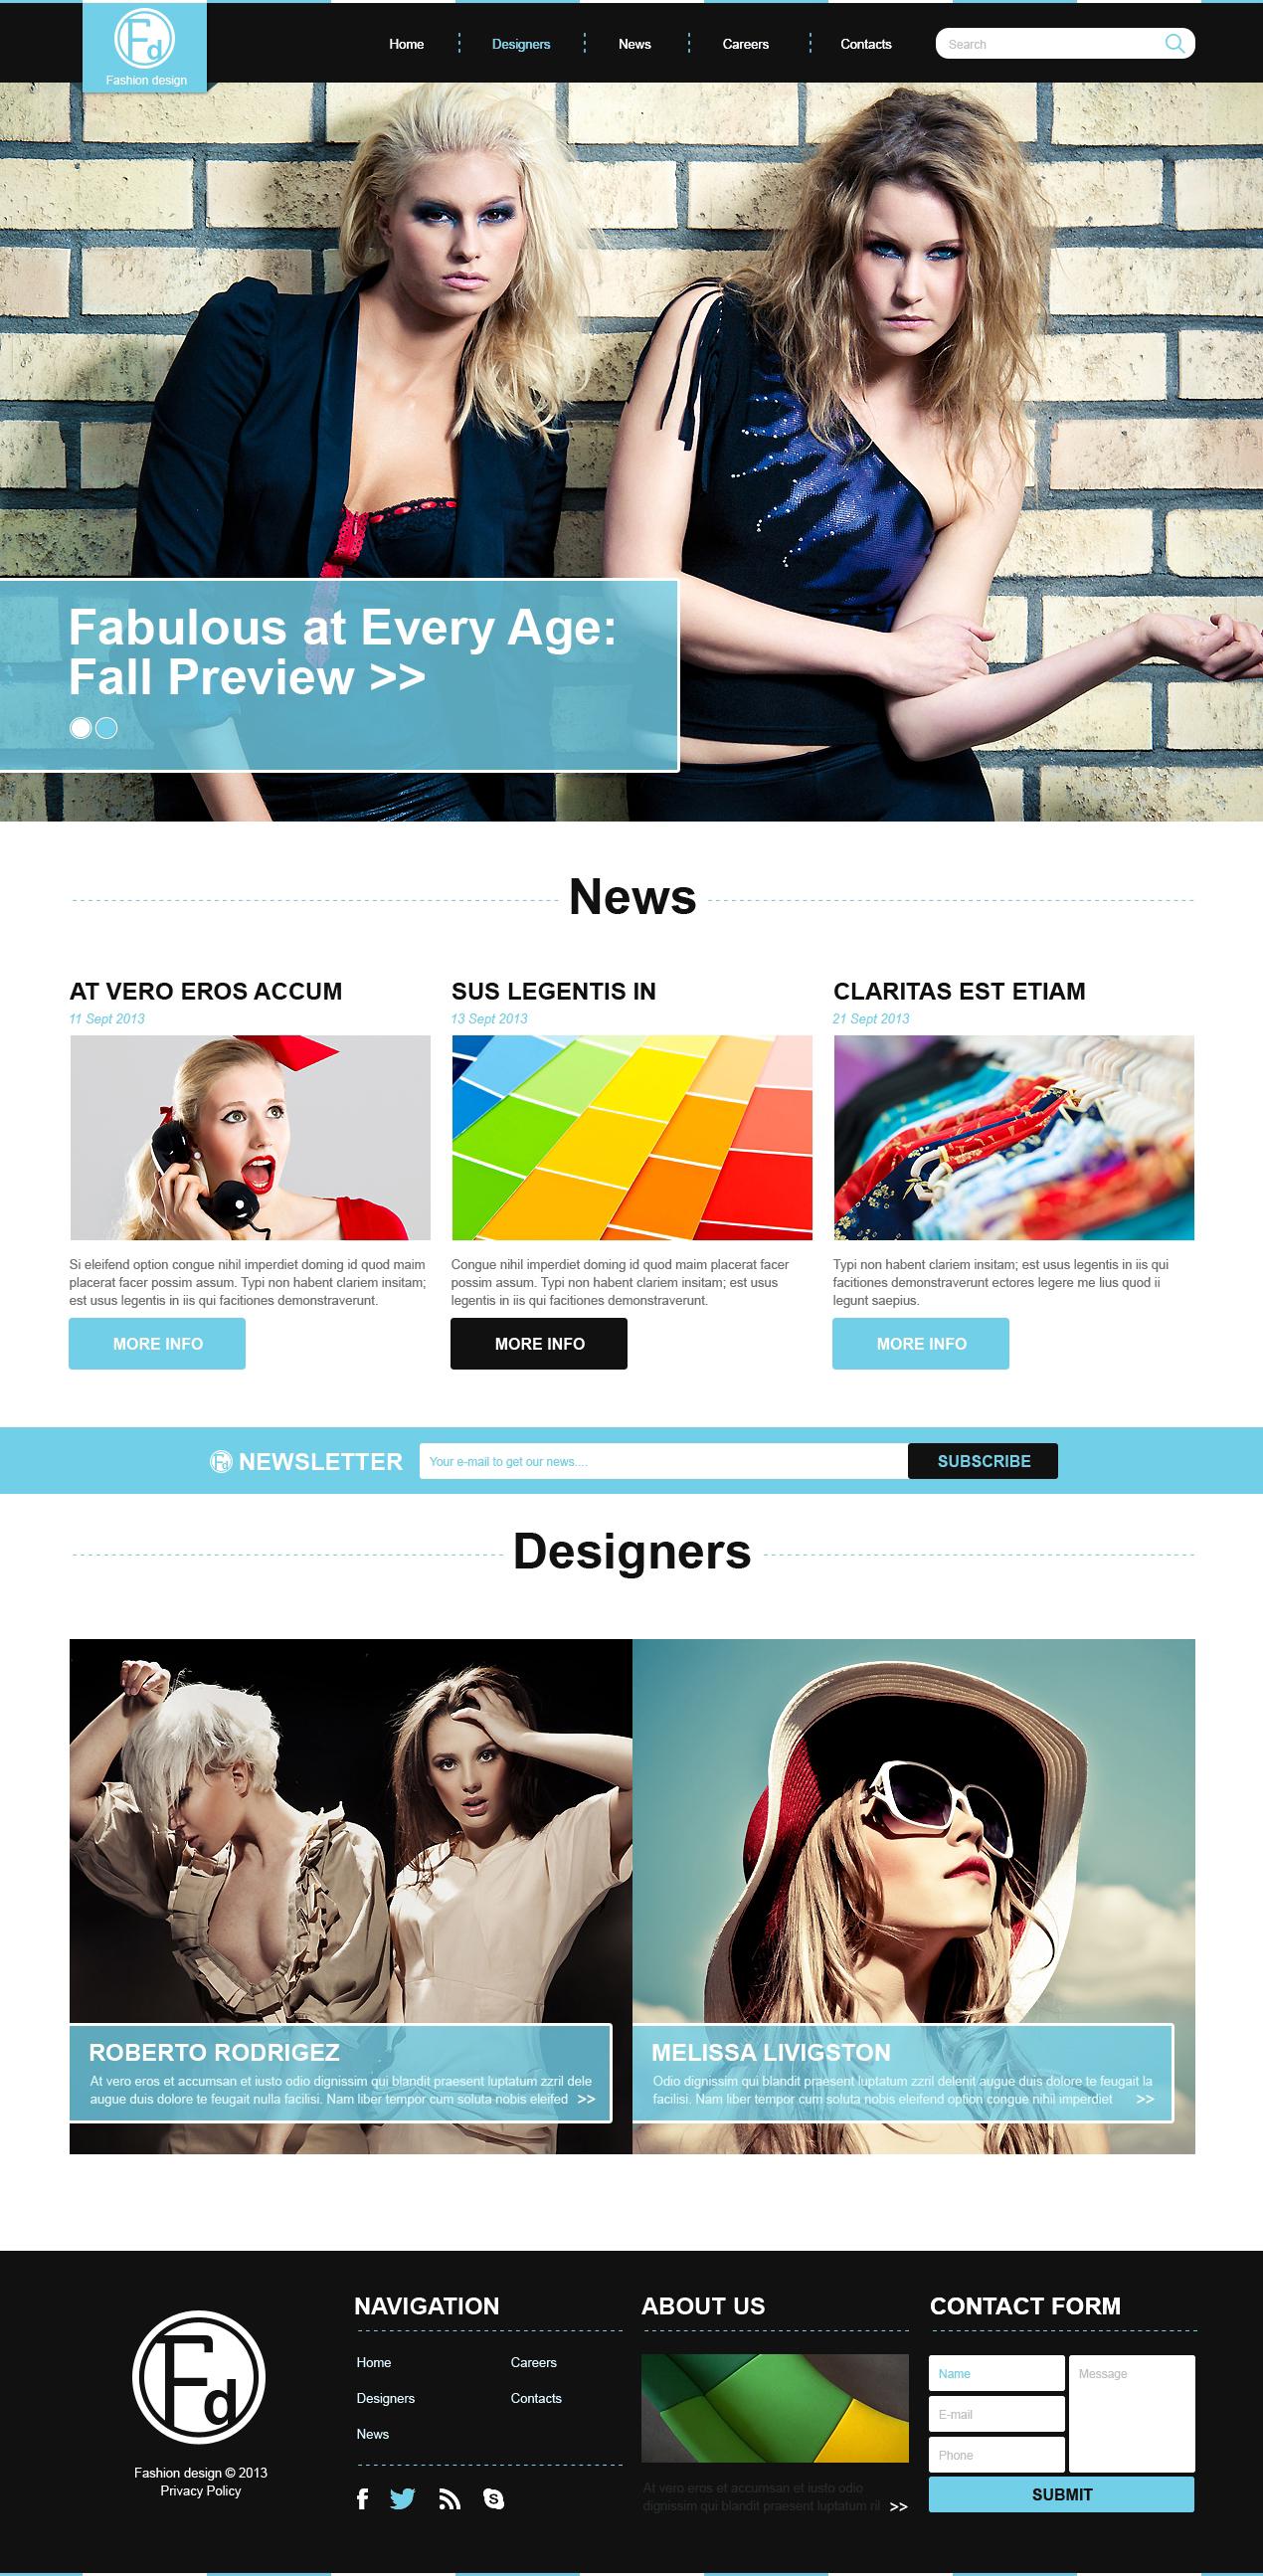 """Fashion Design School"" 响应式Joomla模板 #47945 - 截图"